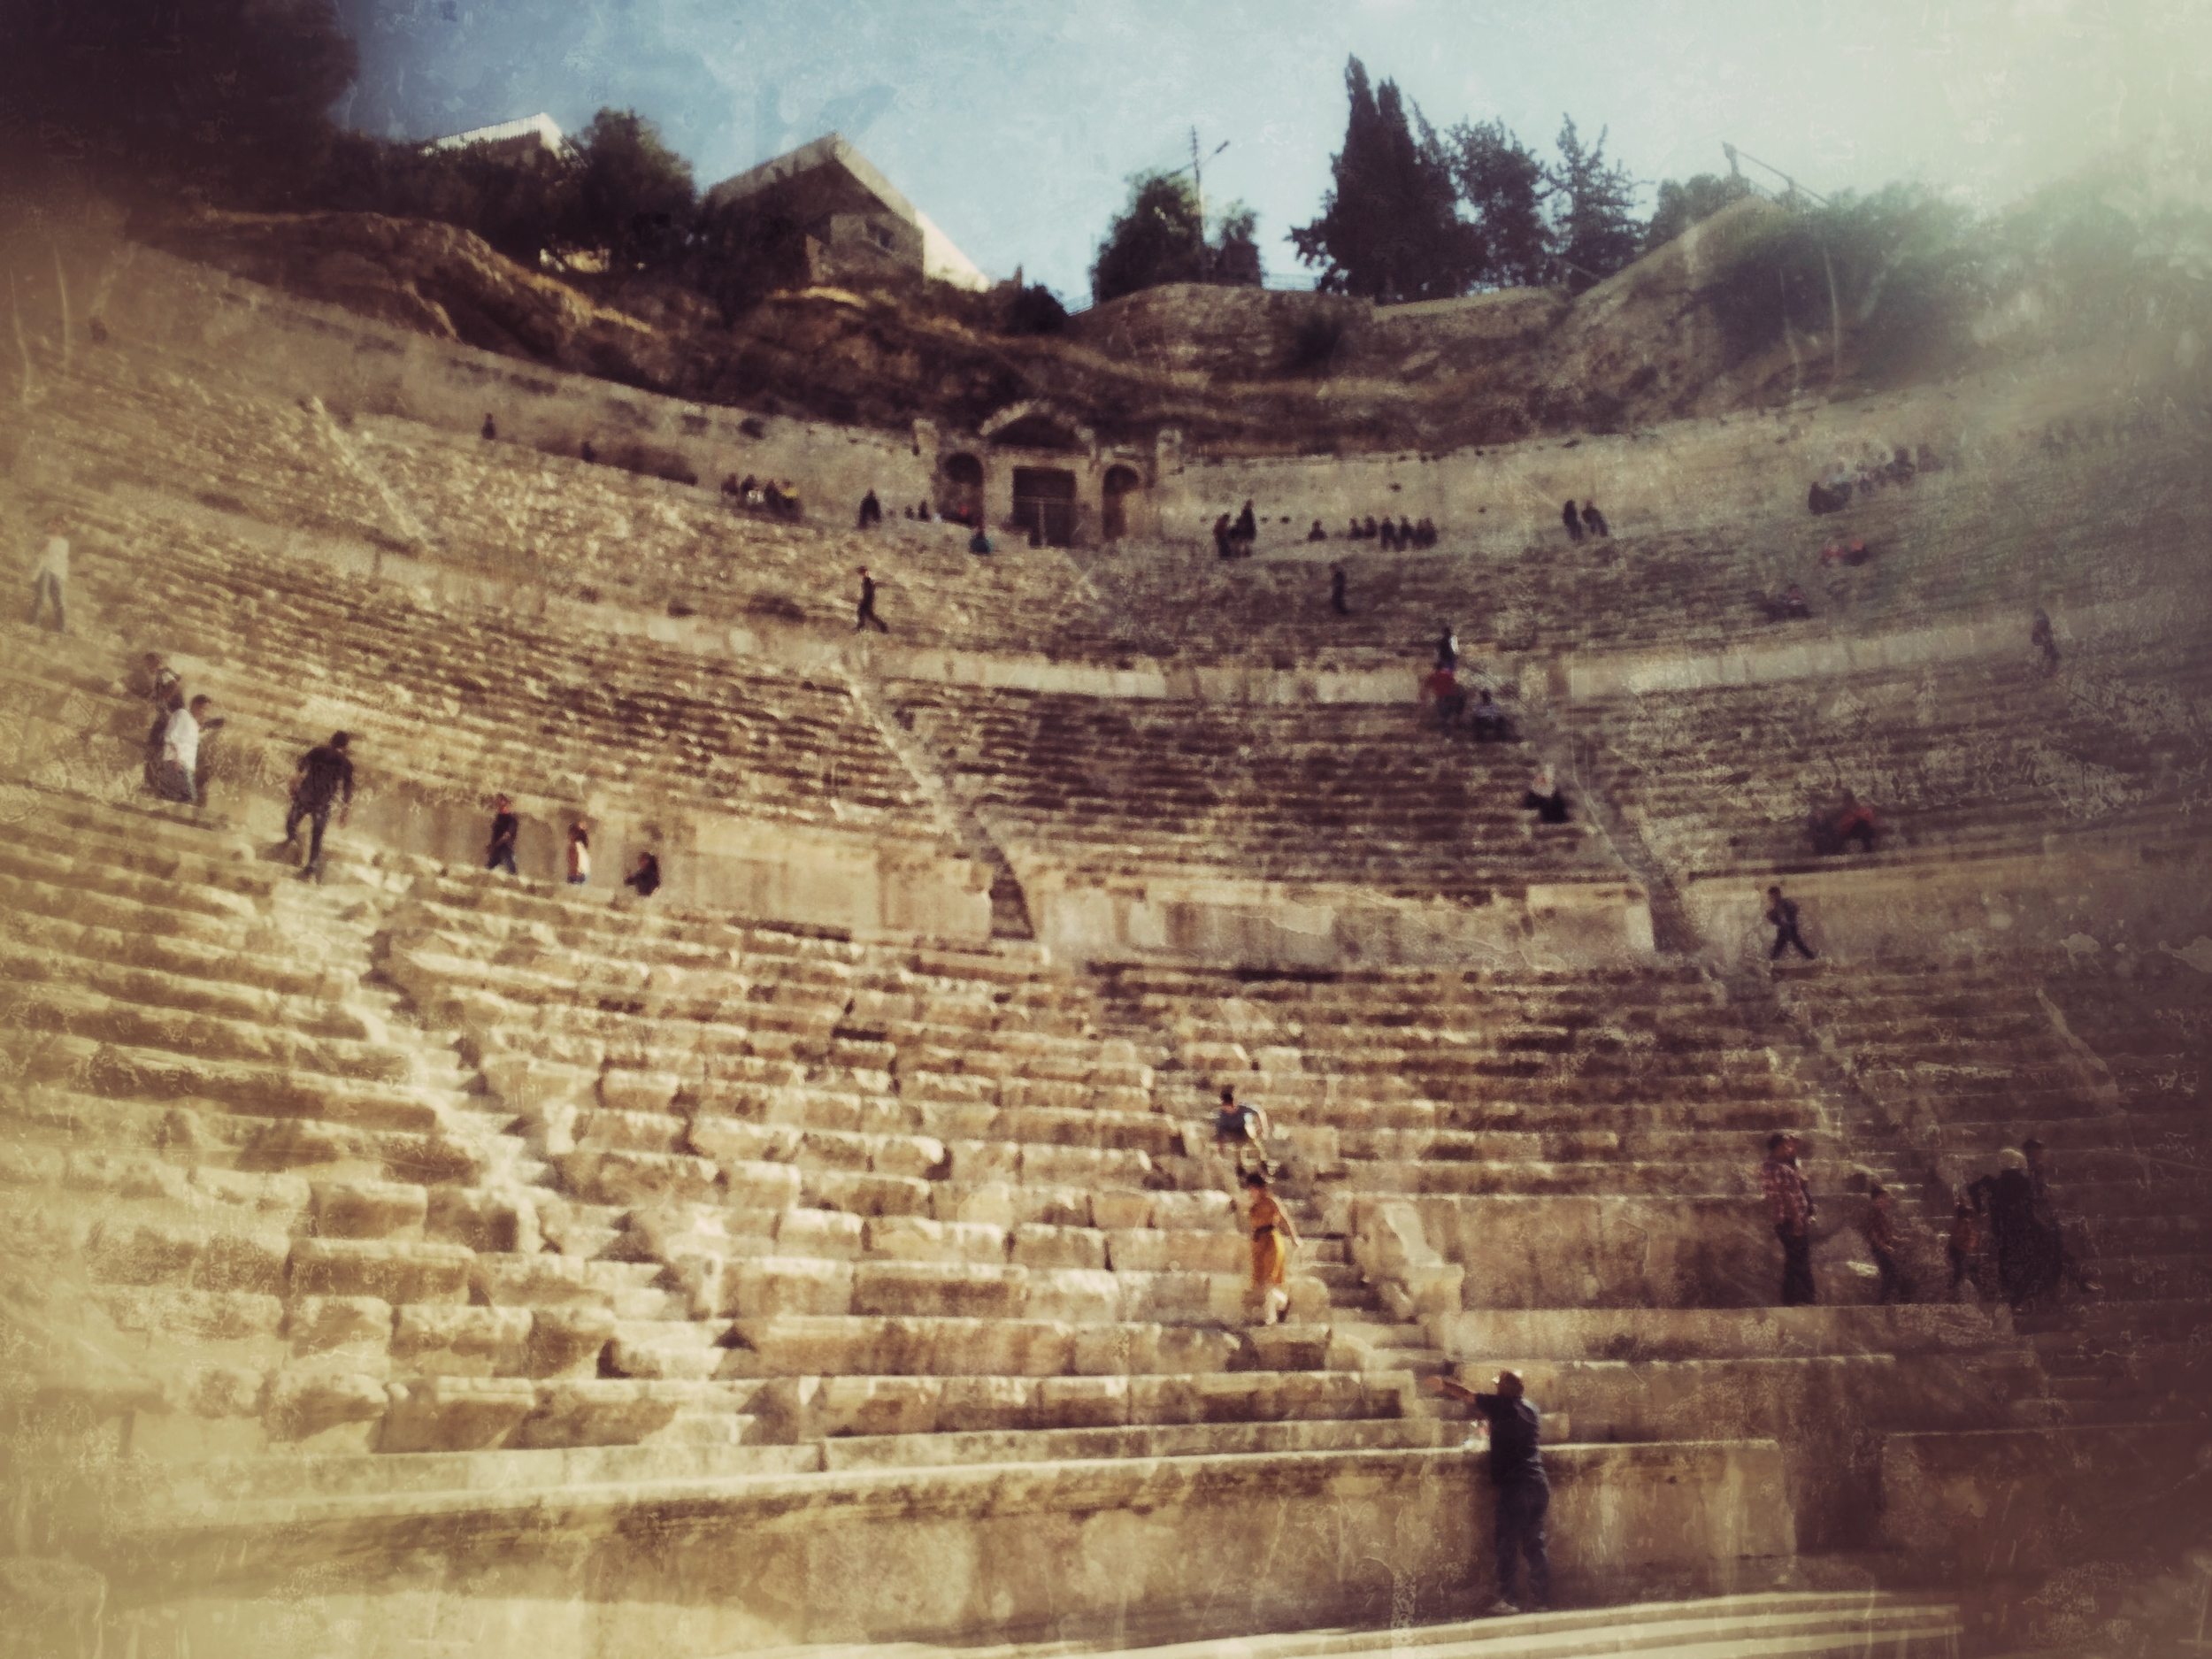 From the floor of The Roman Arena (Ok, Amphitheater) in Amman, Jordan. October 2014